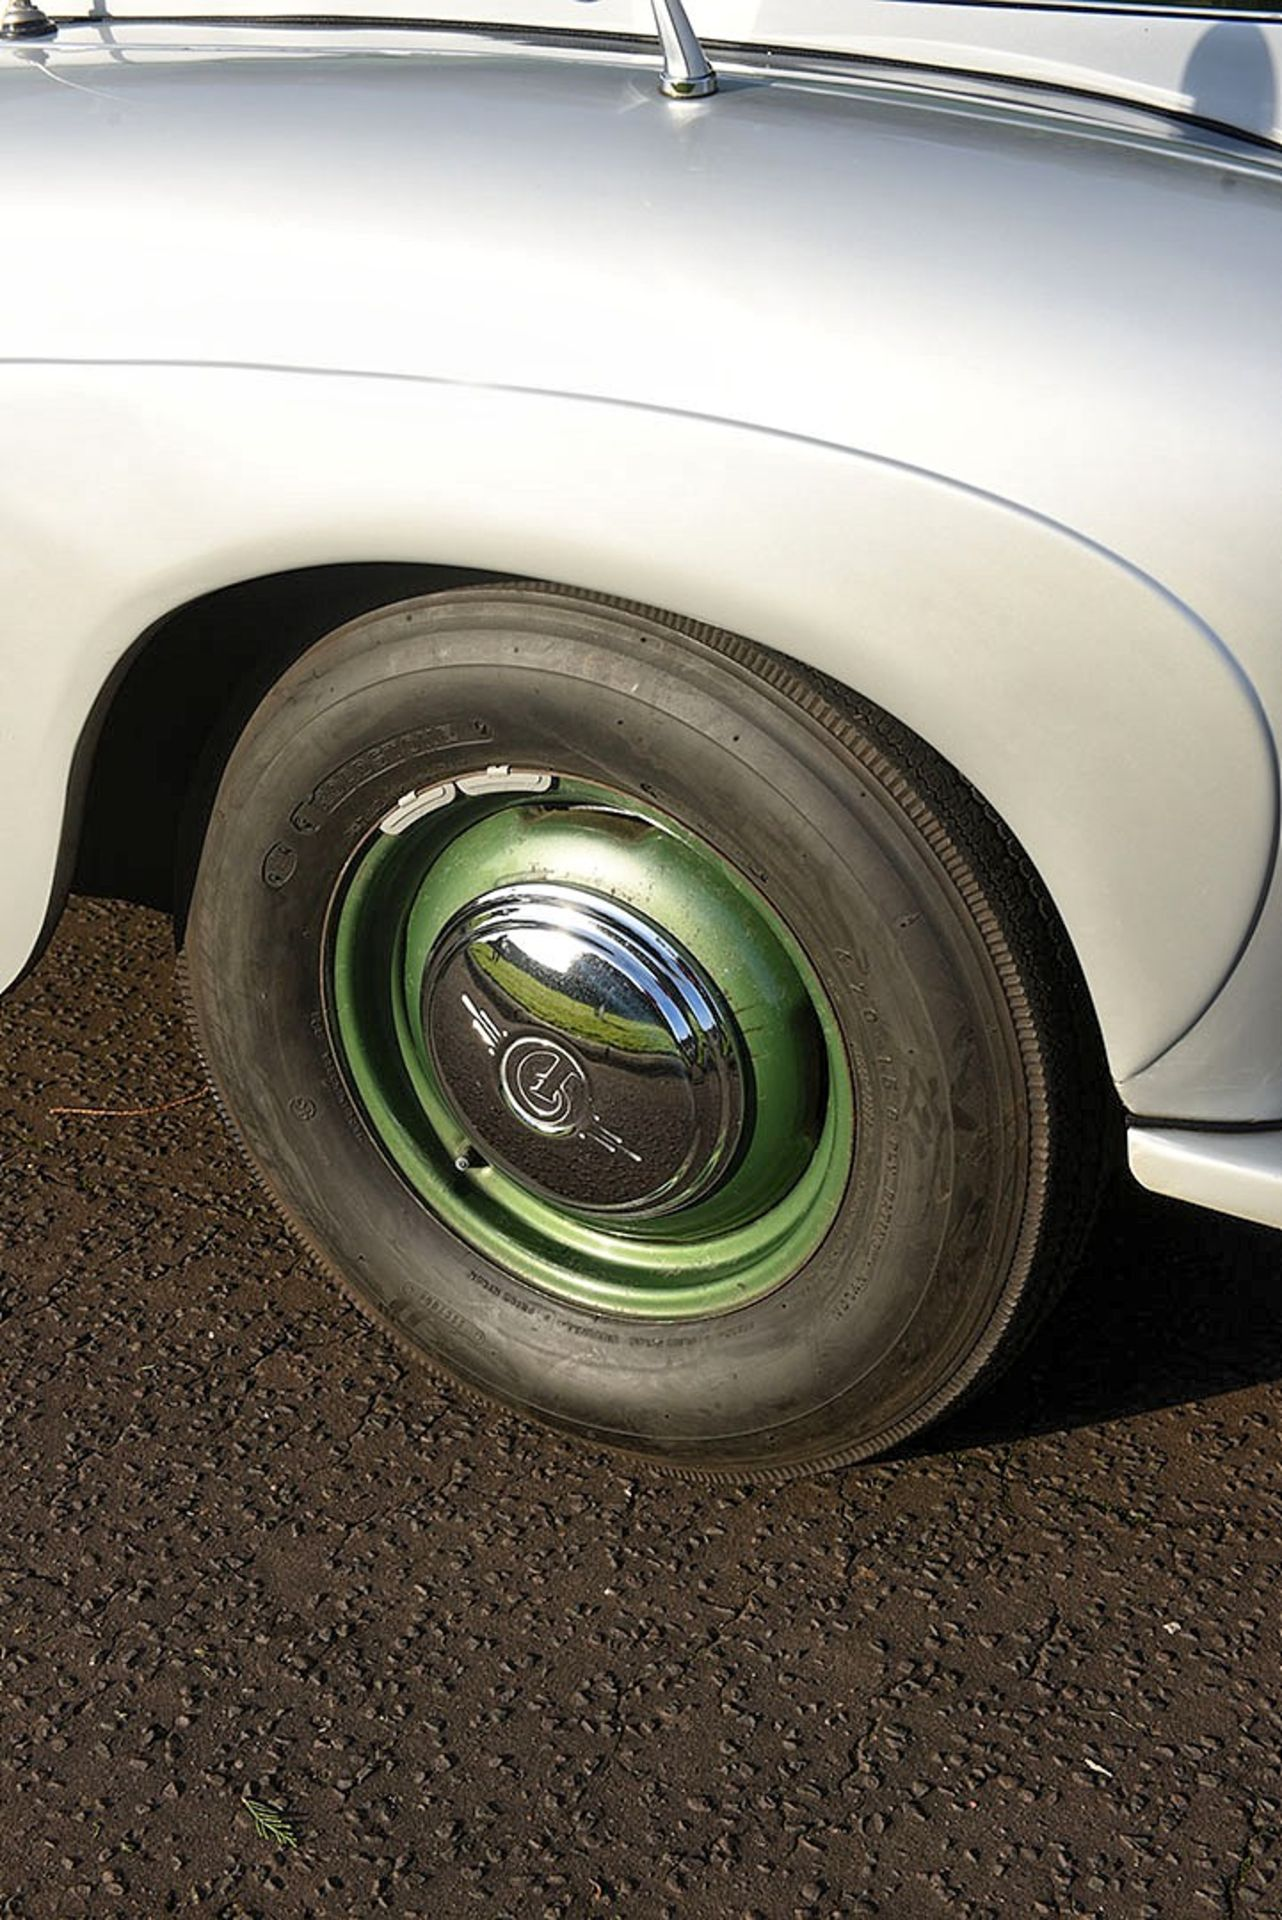 Lot 3 - RXR 390 1955 Daimler Conquest 100 BHP c/w power hood & pre-selector gear box